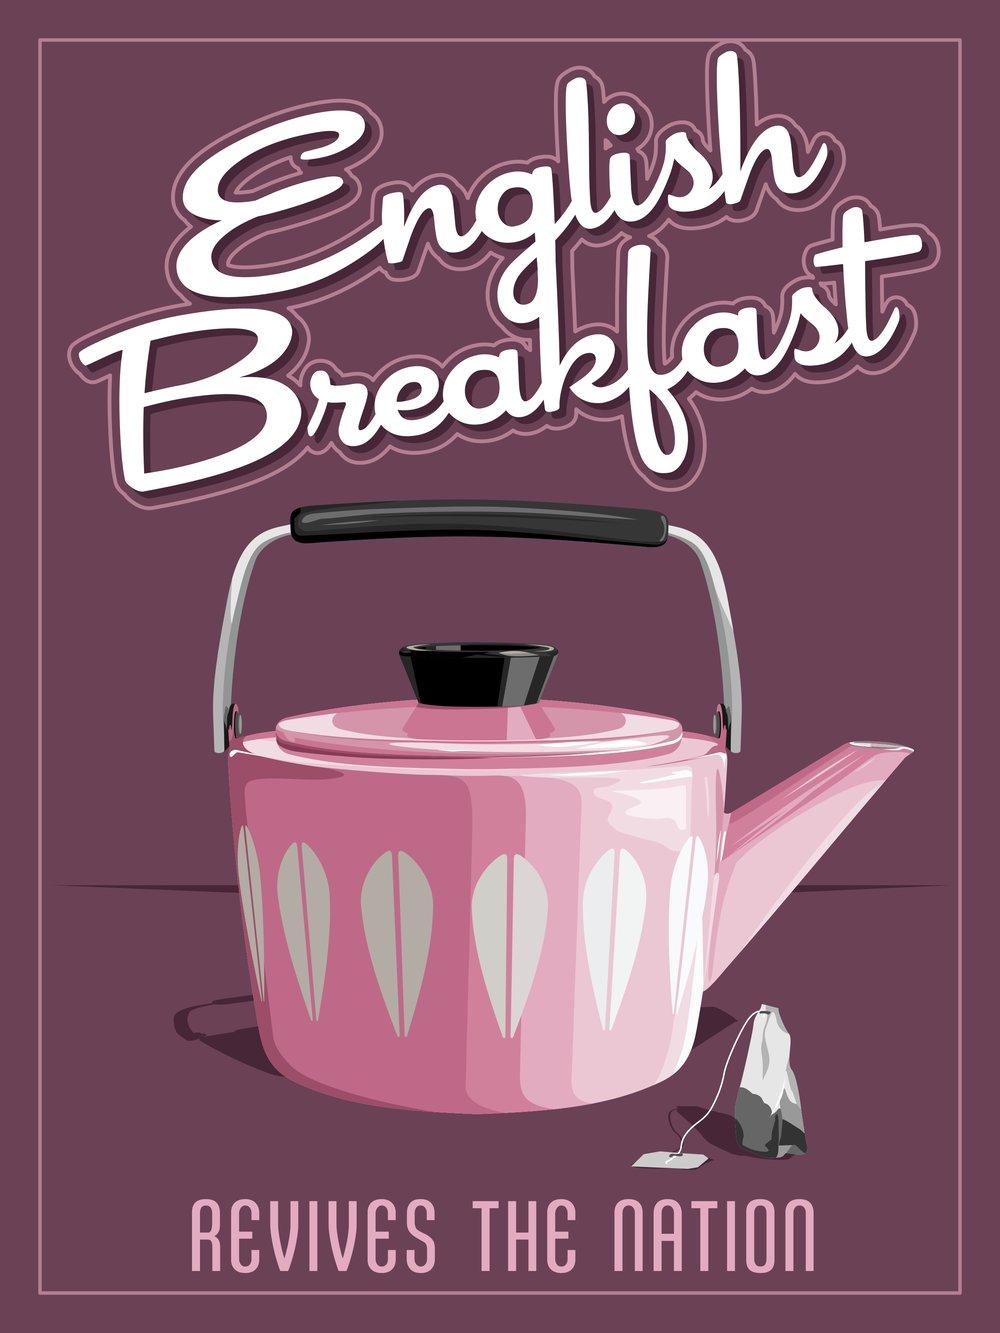 EnglishBreakfastMidcenturyPoster.jpg